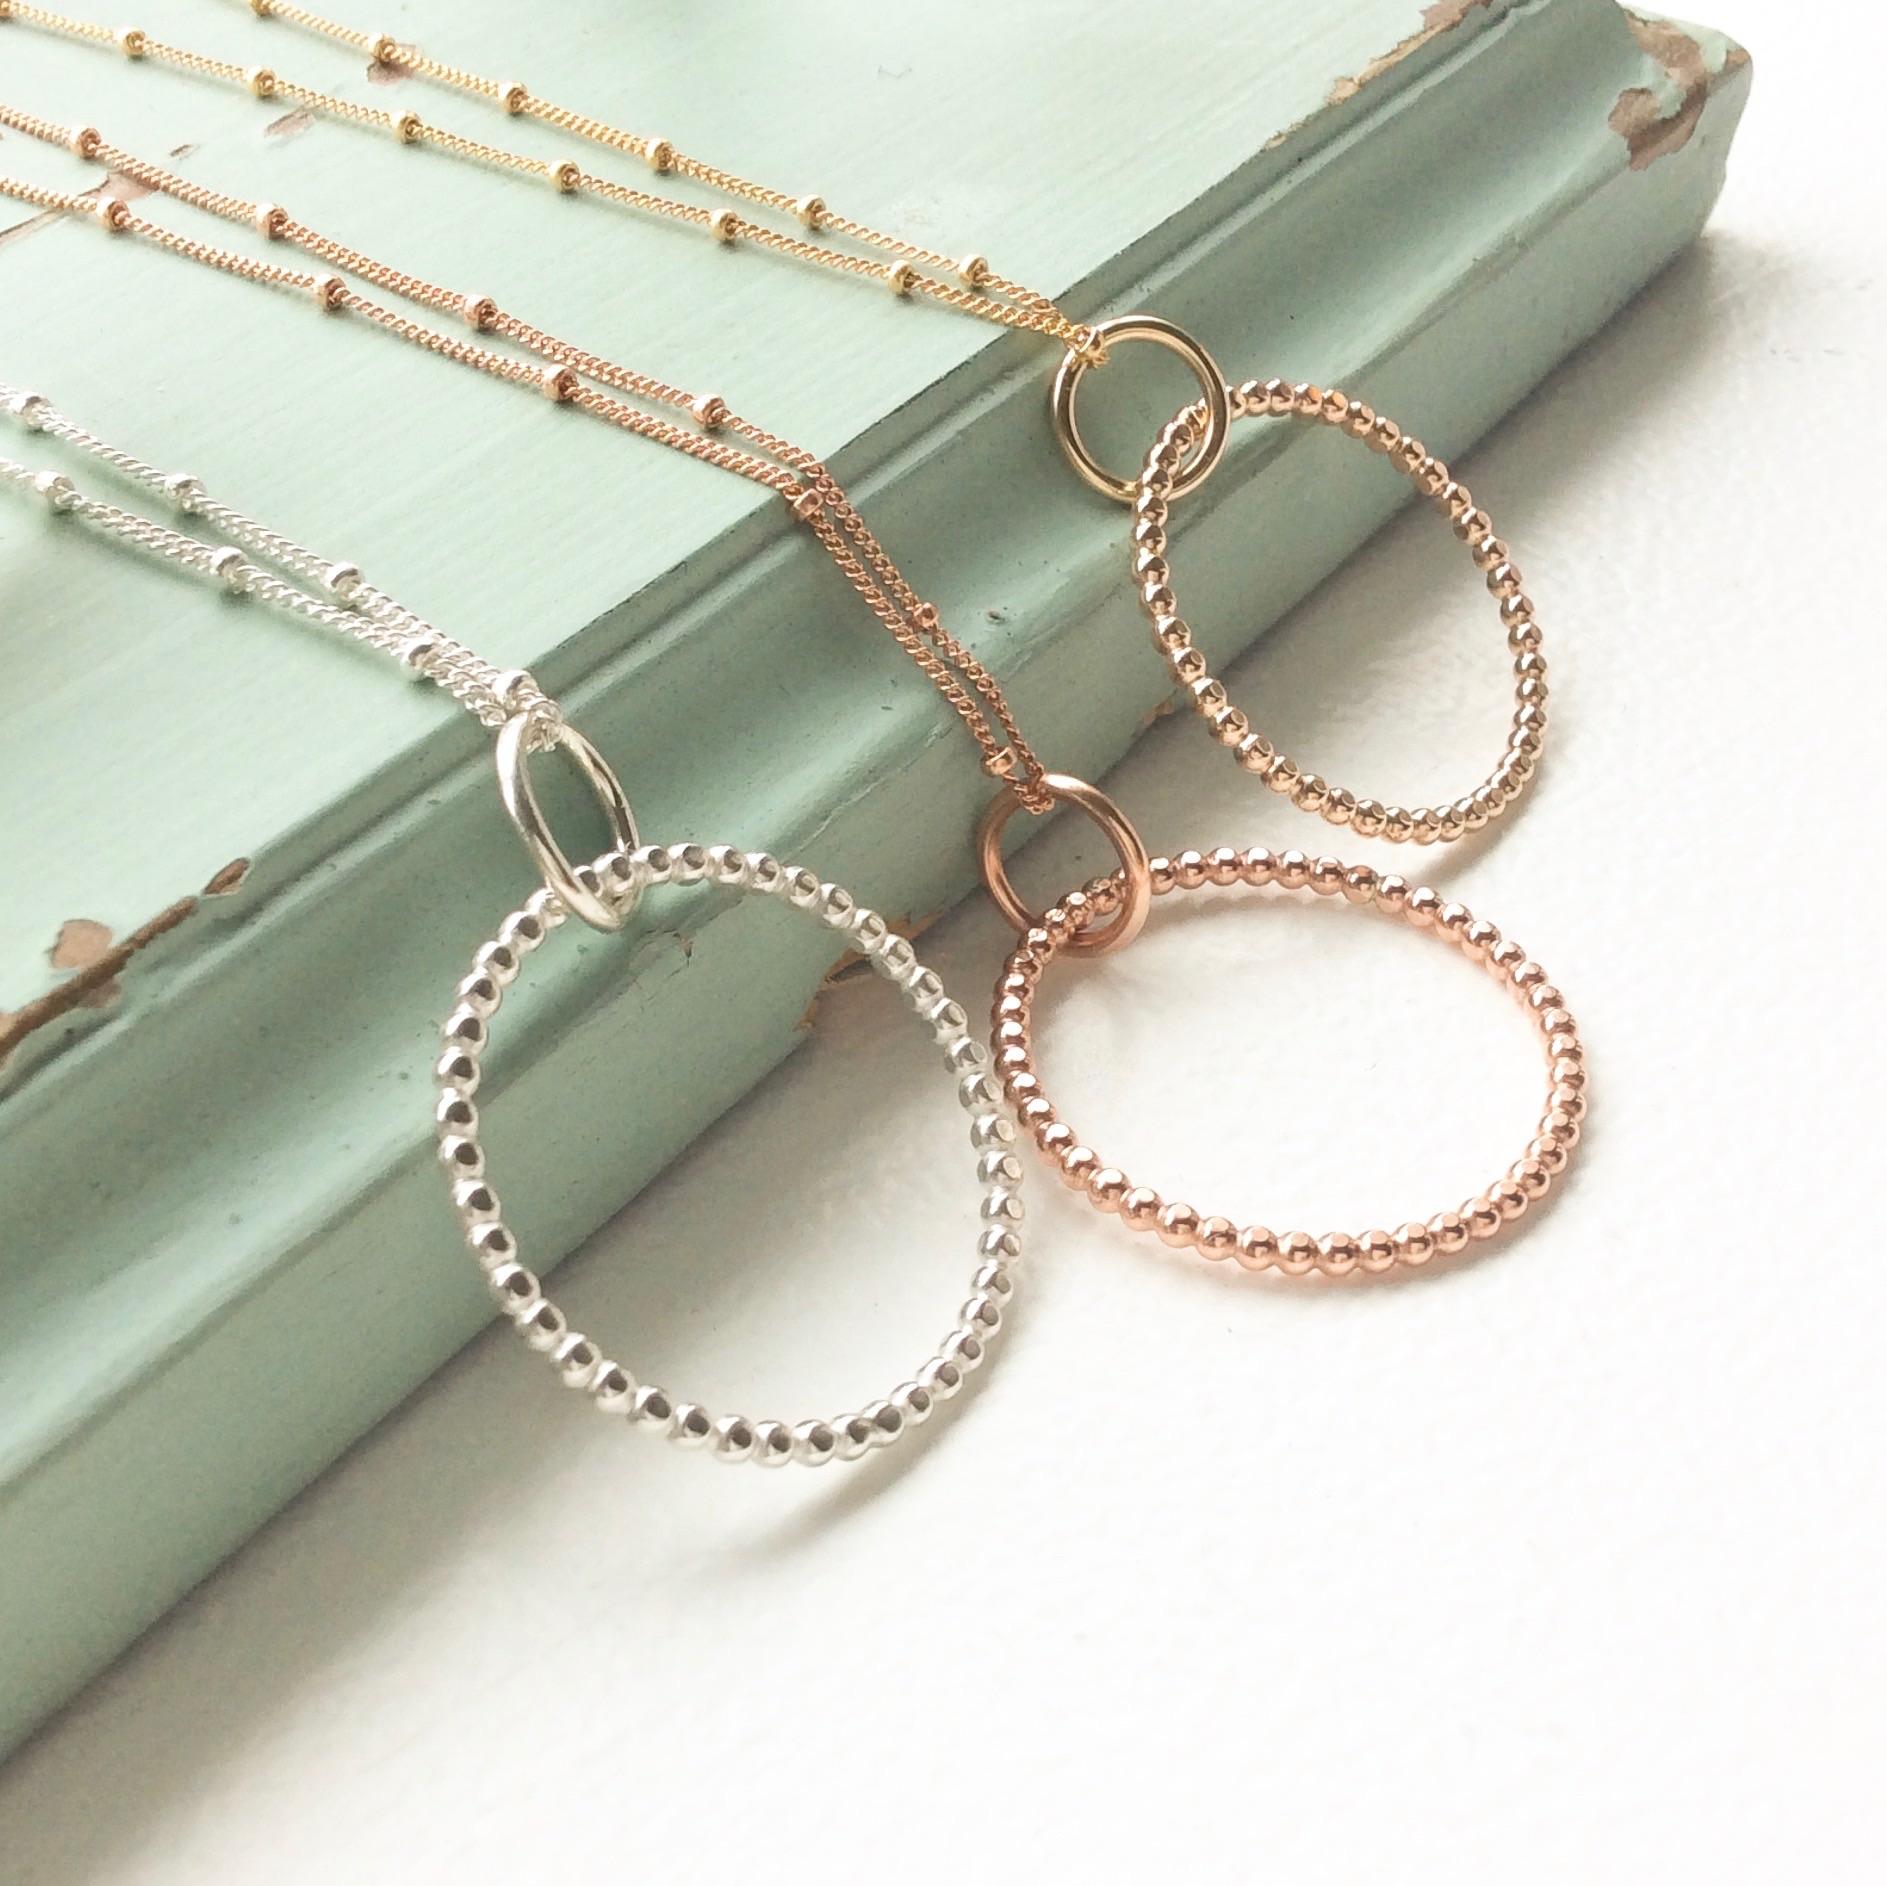 Hexagon trio necklace